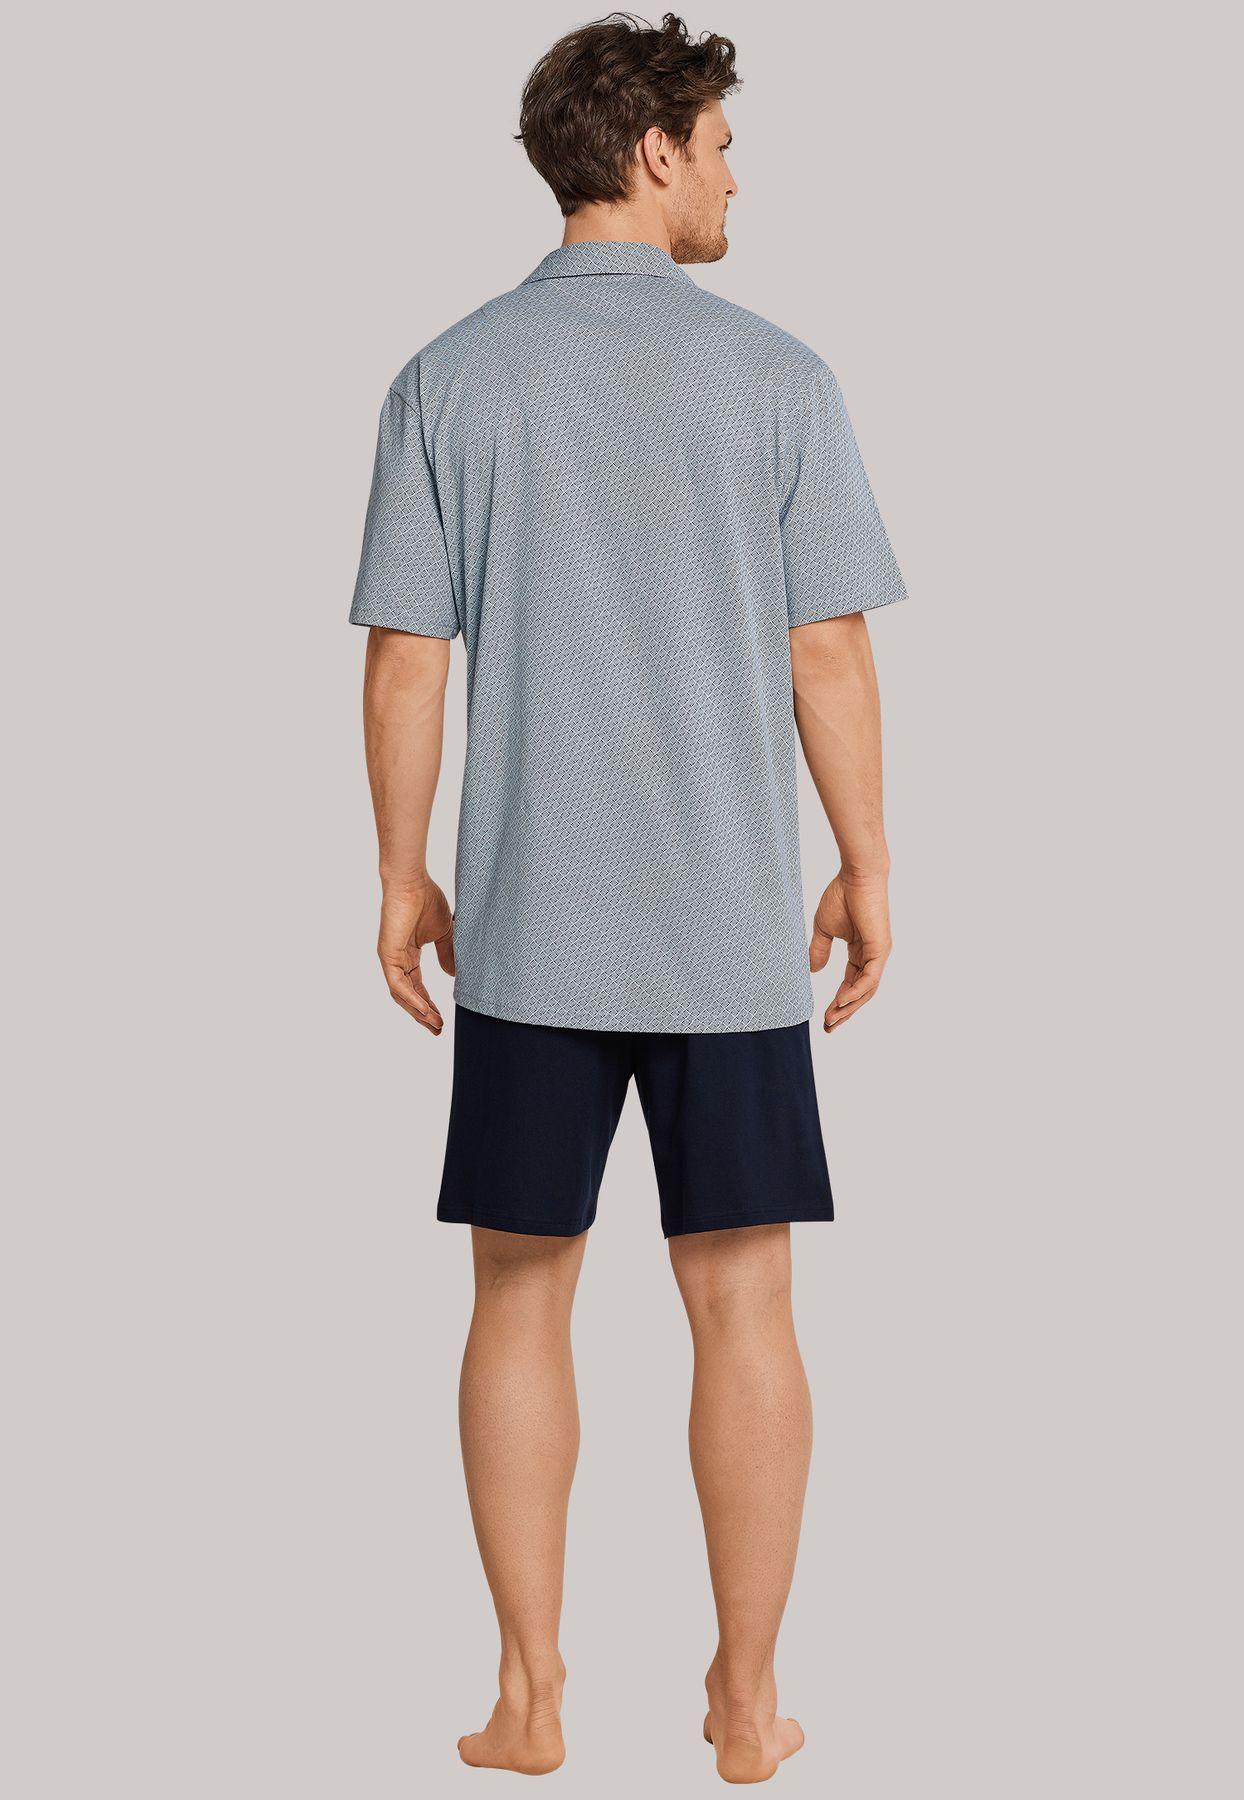 Schiesser - Herren Pyjama kurz Jersey Knopfleiste blau gemustert (163638-803) – Bild 2